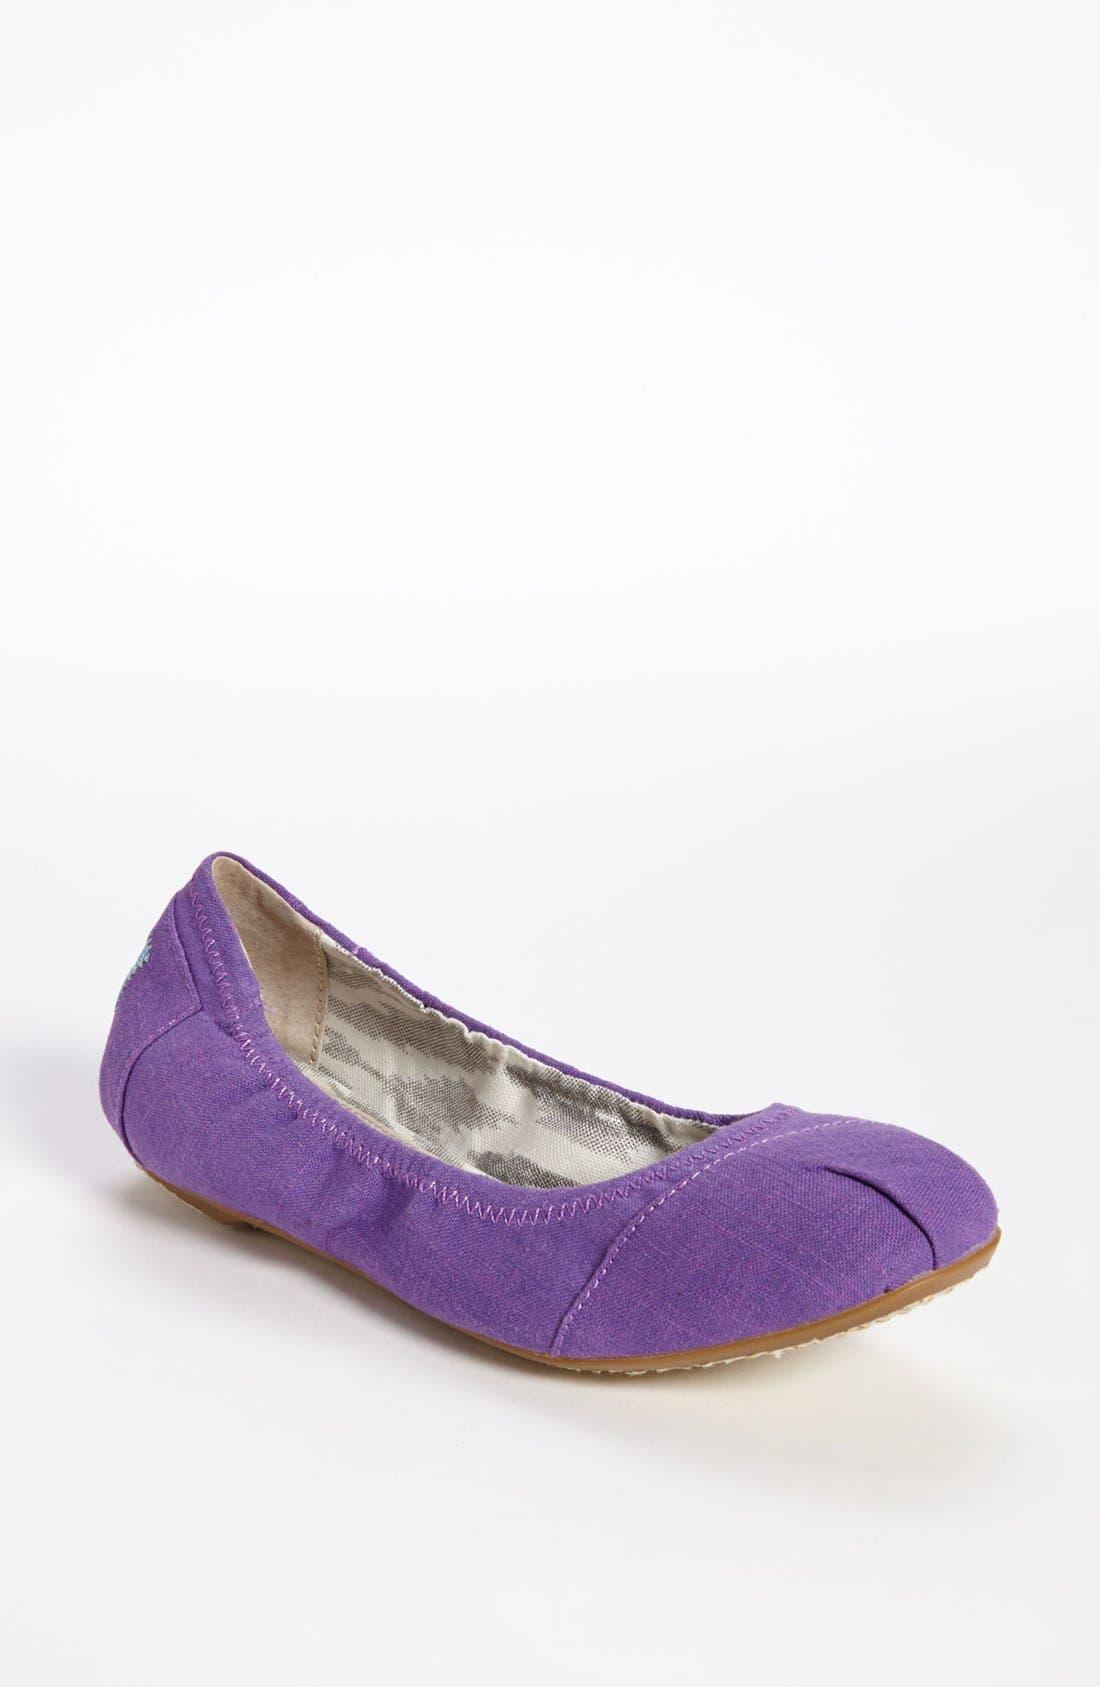 Alternate Image 1 Selected - TOMS Ballet Flat (Women)